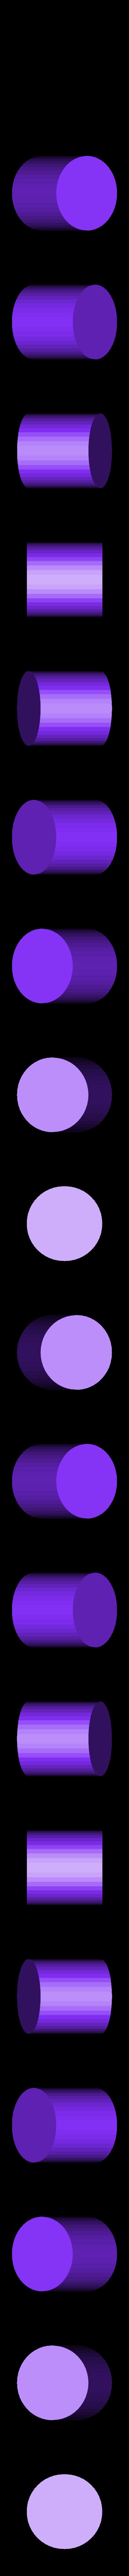 DM_Pegs_01_1.stl Download free STL file Dark Matter - Main Title Logo • 3D printer object, SYFY